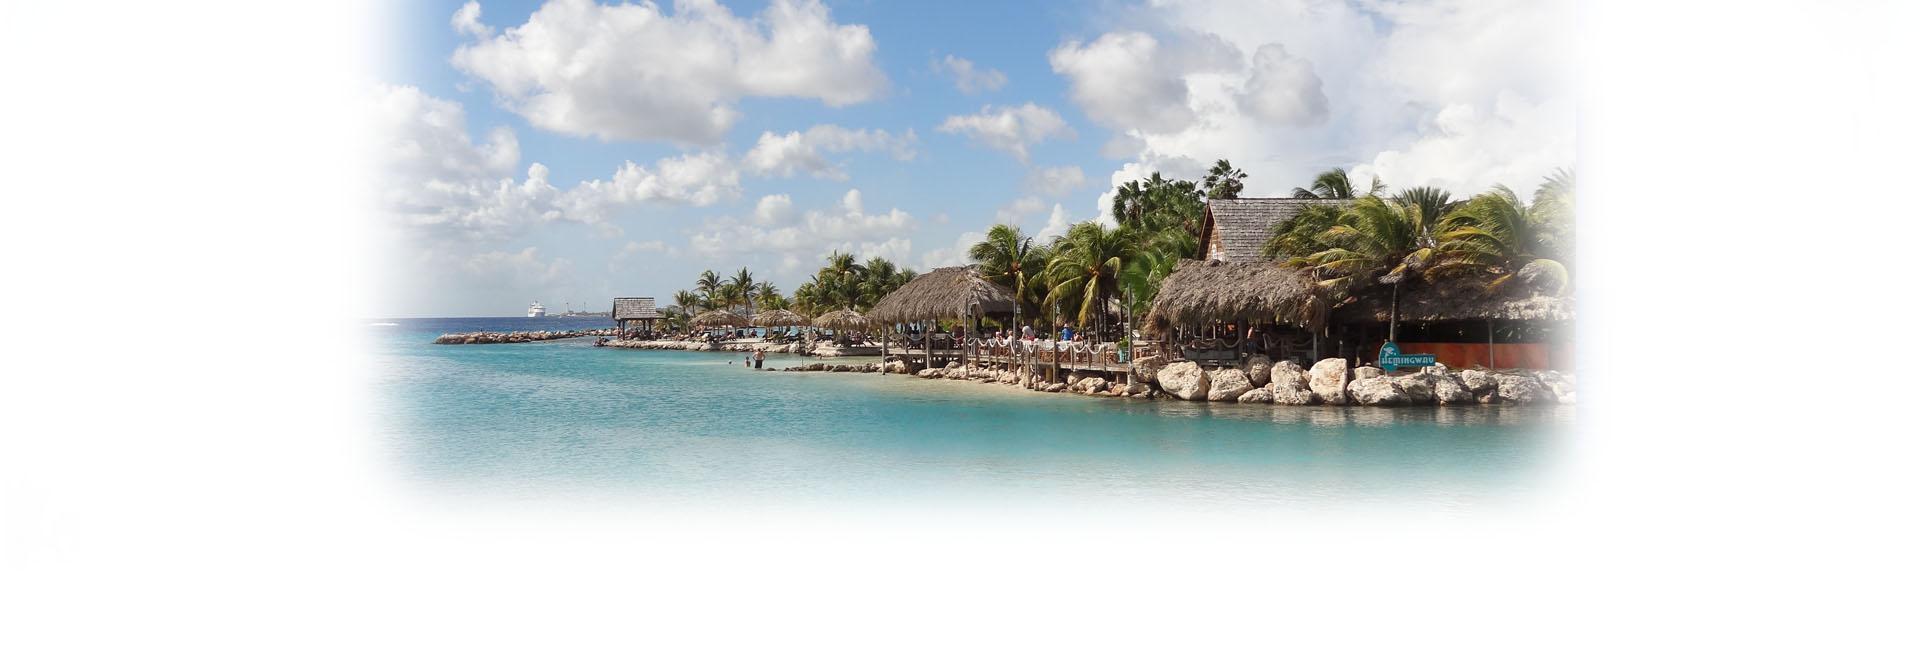 Wetravel2 Curaçao